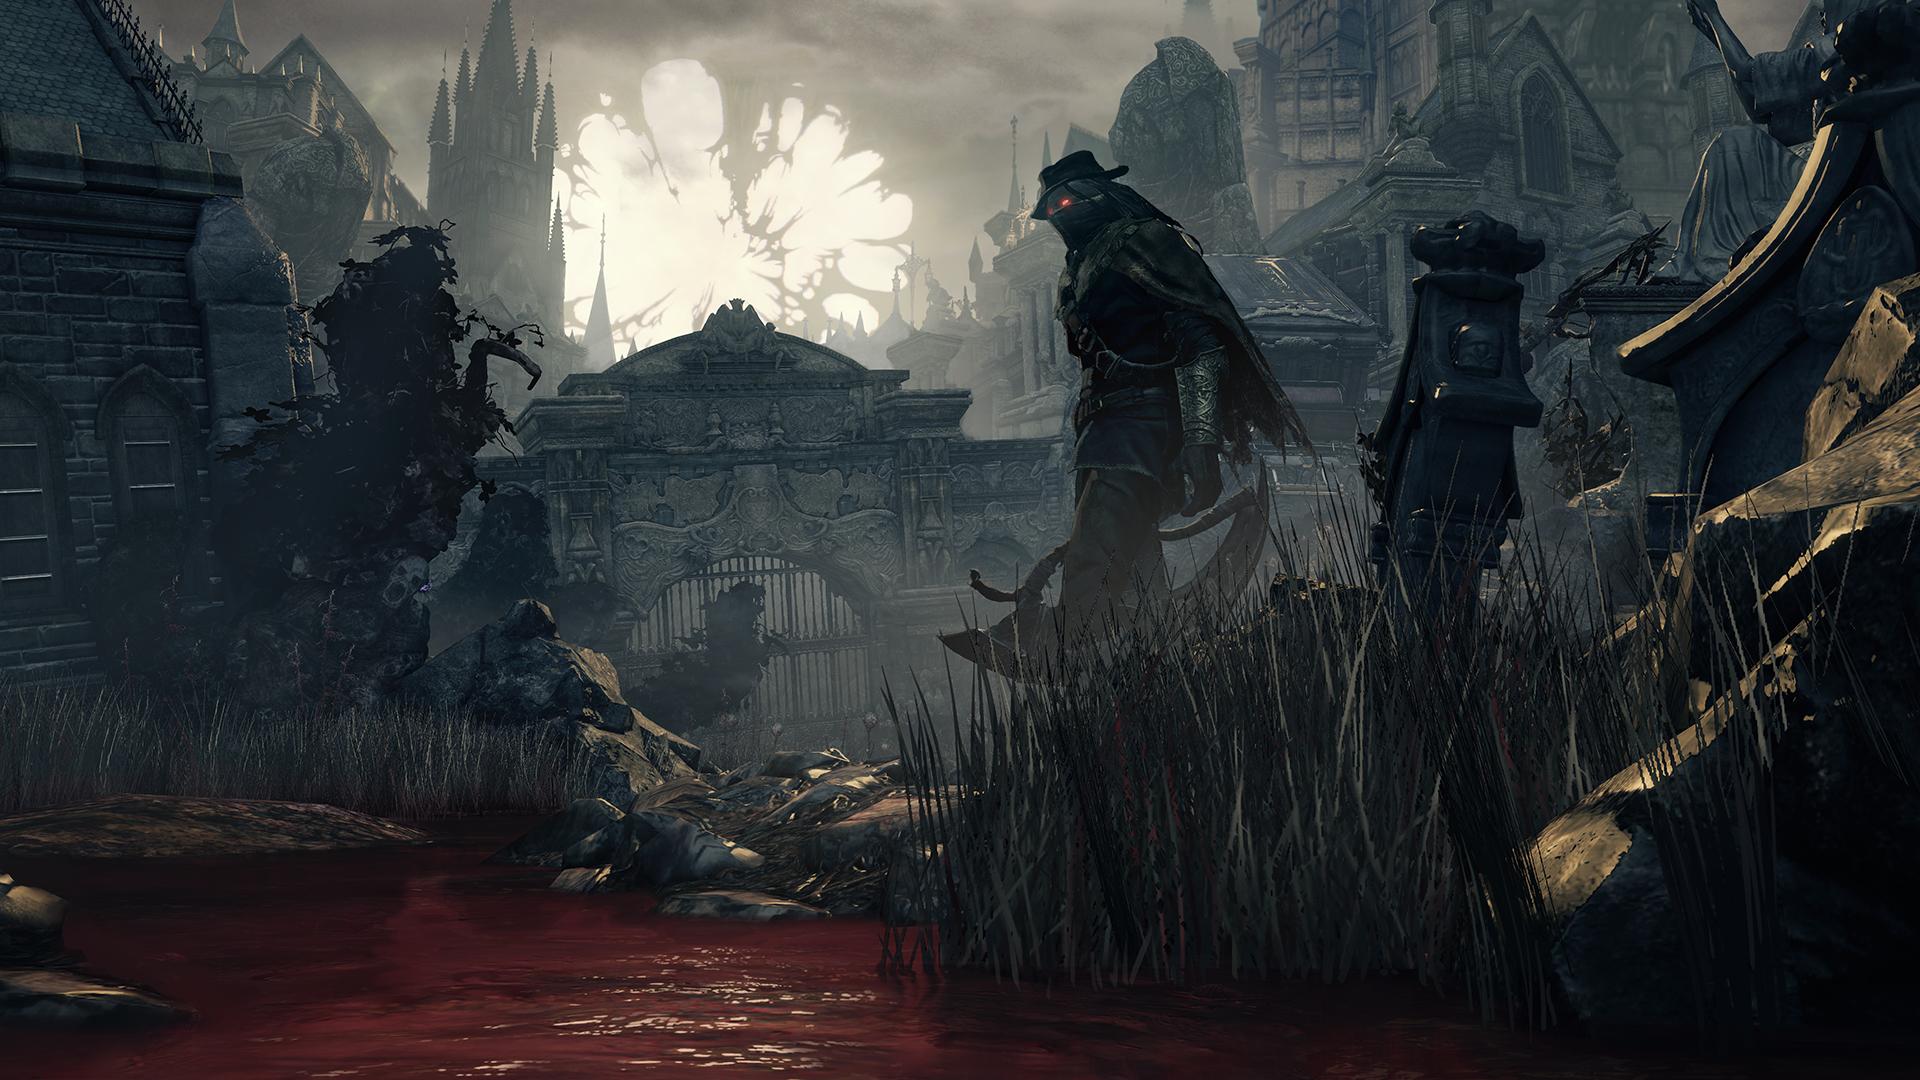 Bloodborne board game adaptation